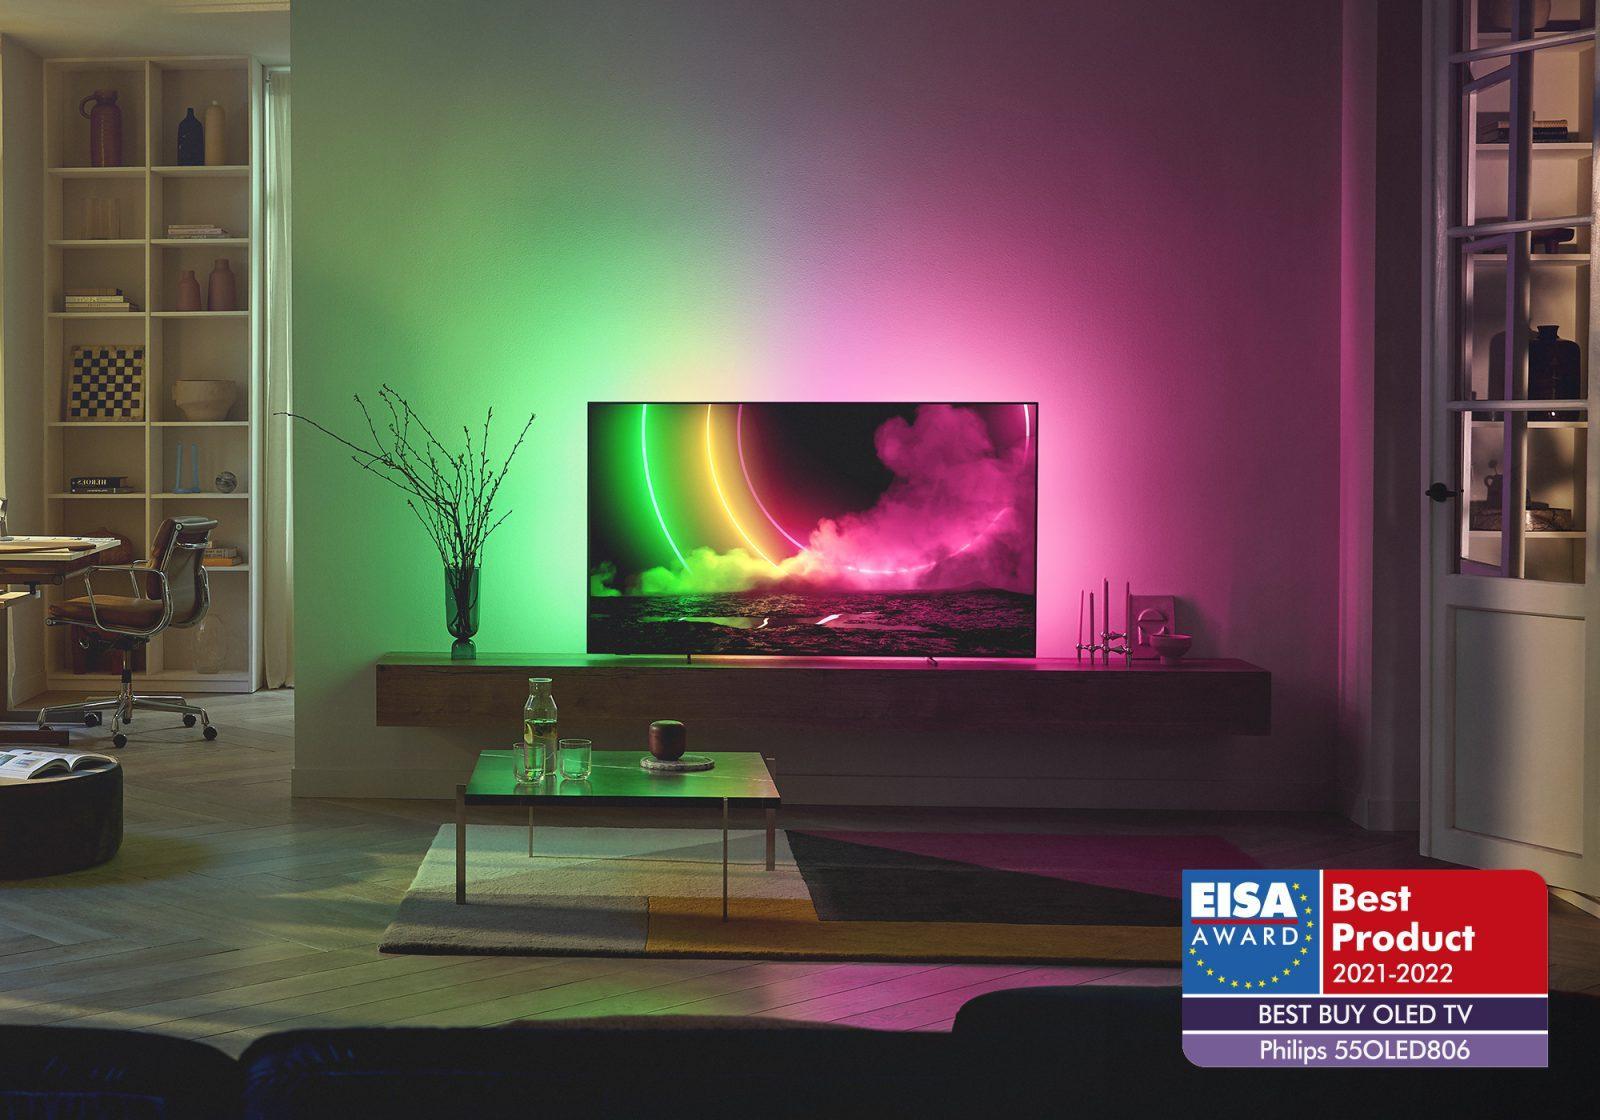 Аудиотехника и телевизоры Philips получили четыре премии EISA (oled 806 lifestyle)